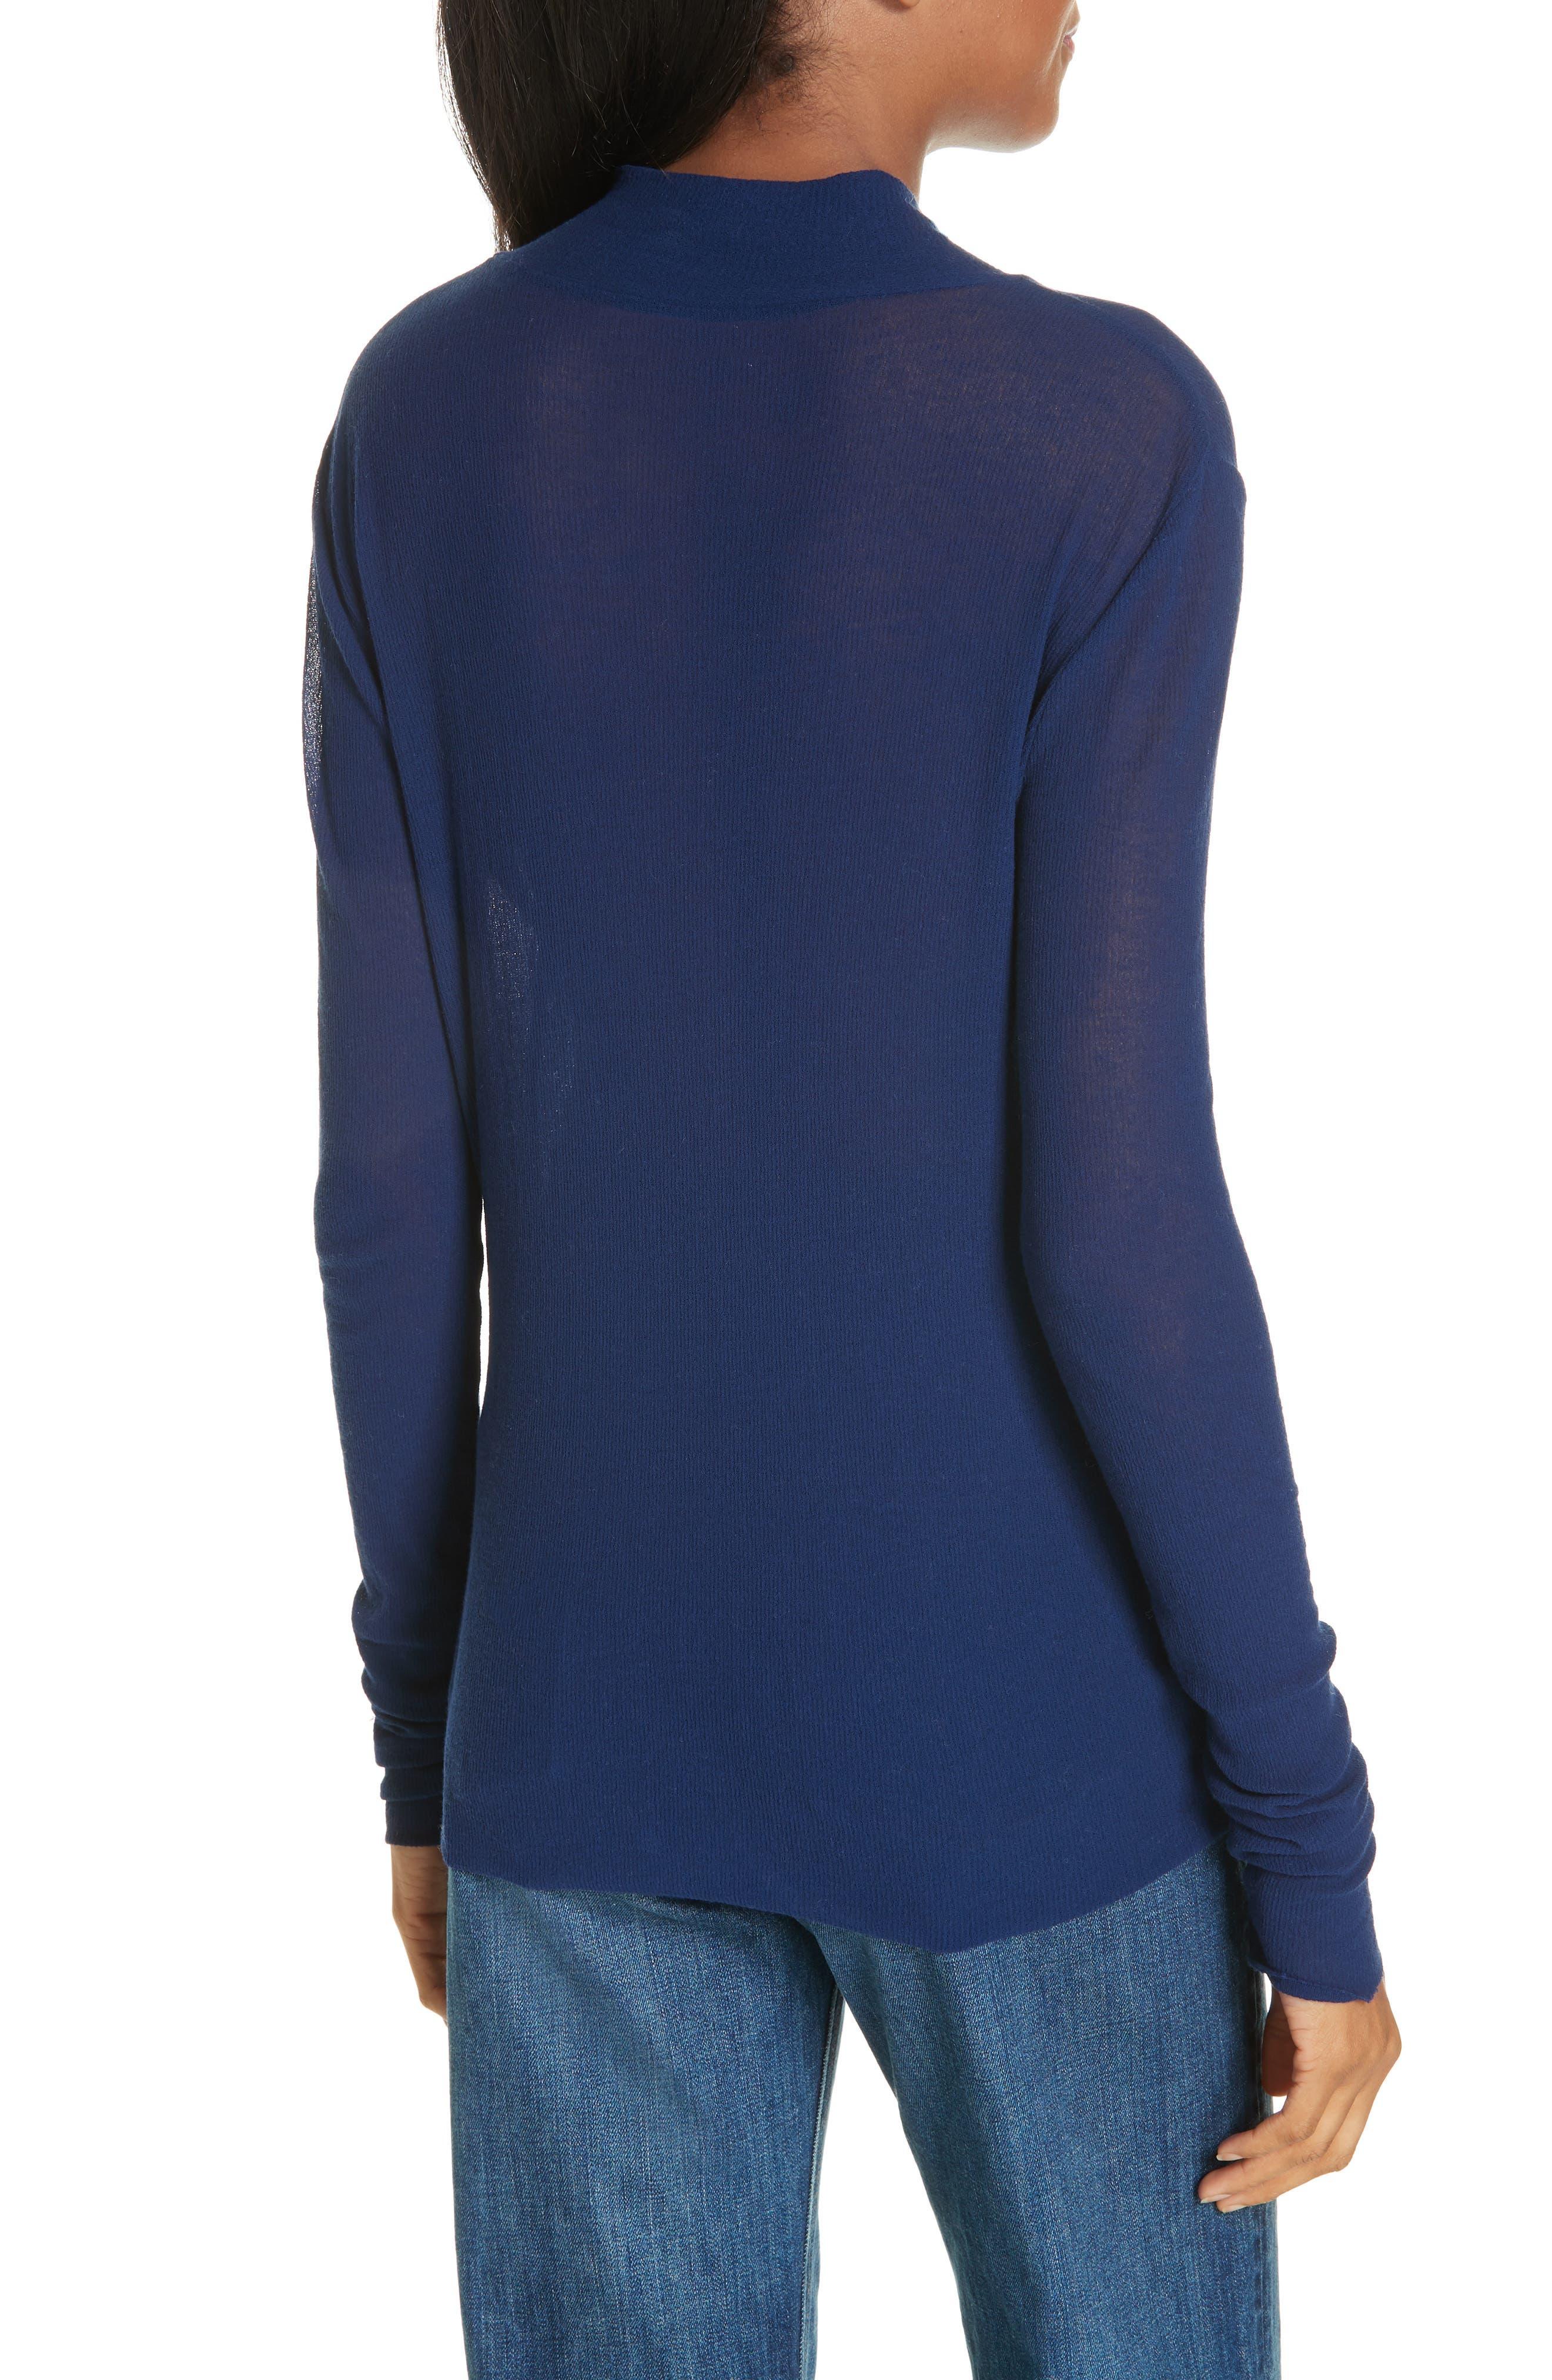 Turtleneck Sweater,                             Alternate thumbnail 2, color,                             406